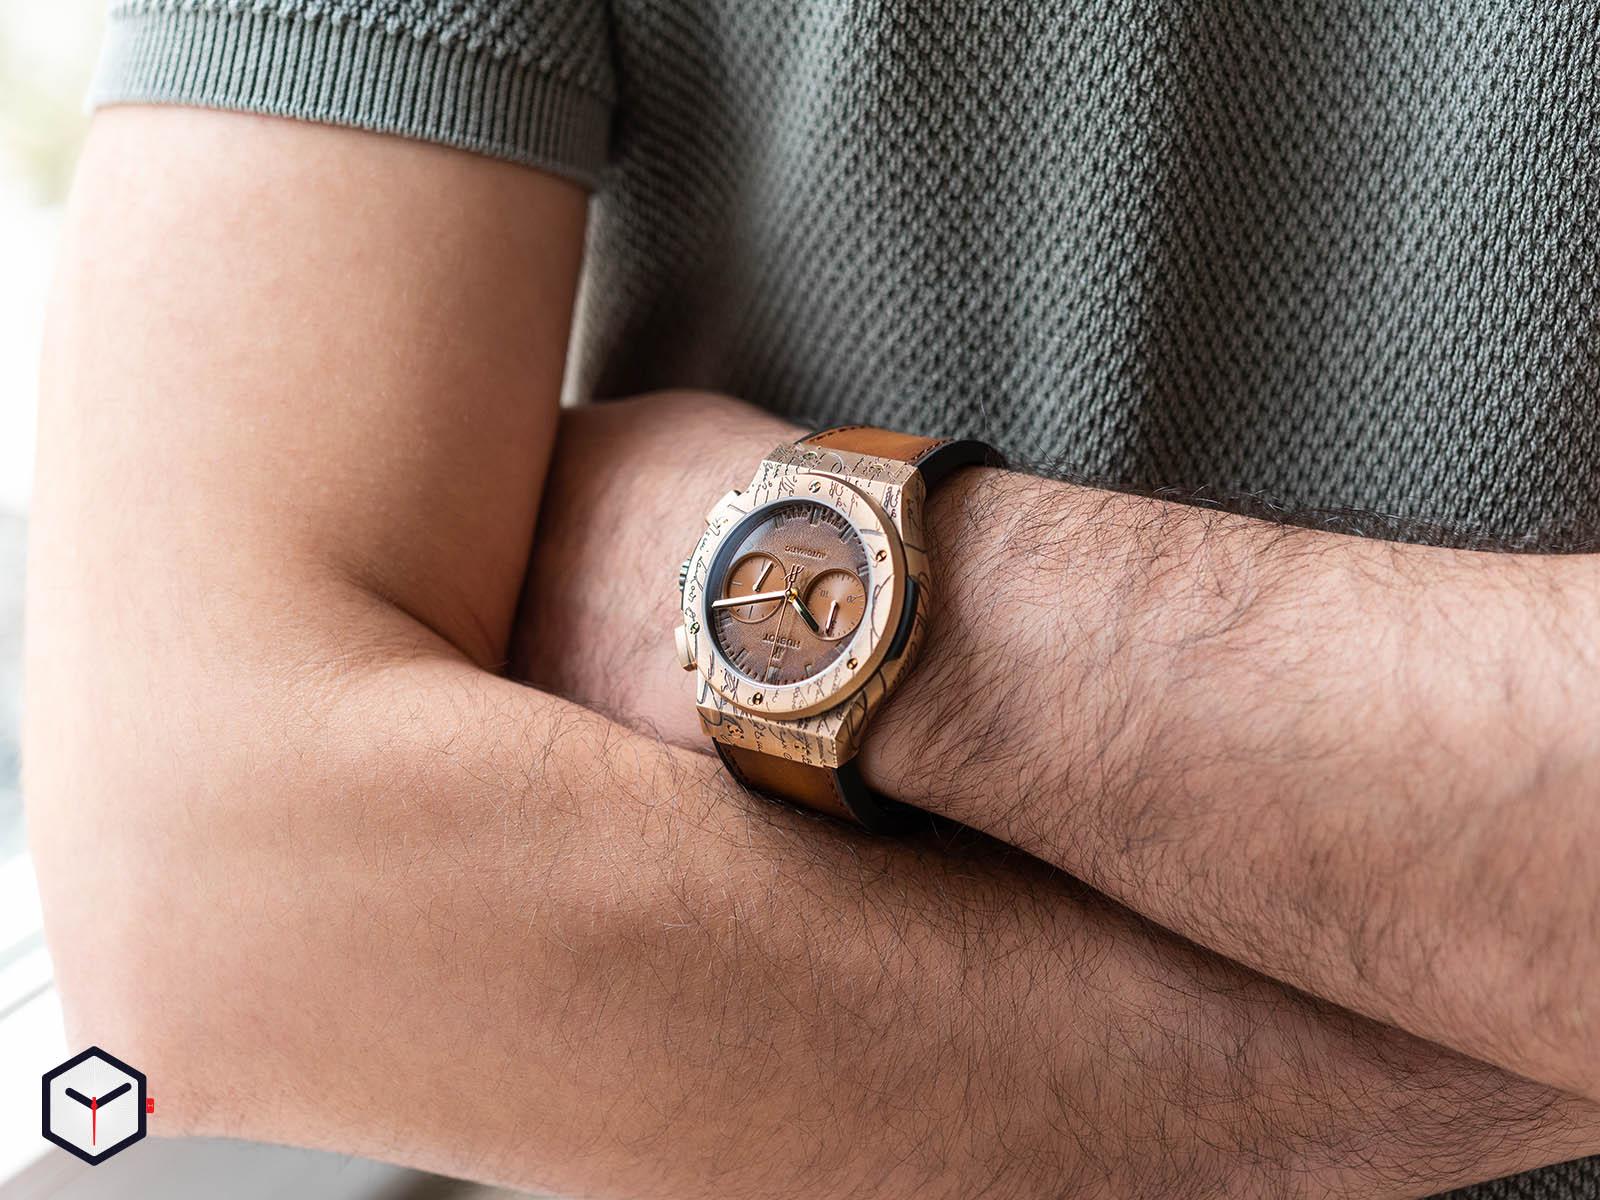 521-bz-05ig-vr-ber19-hublot-classic-fusion-chronograph-berluti-cold-gold-8.jpg